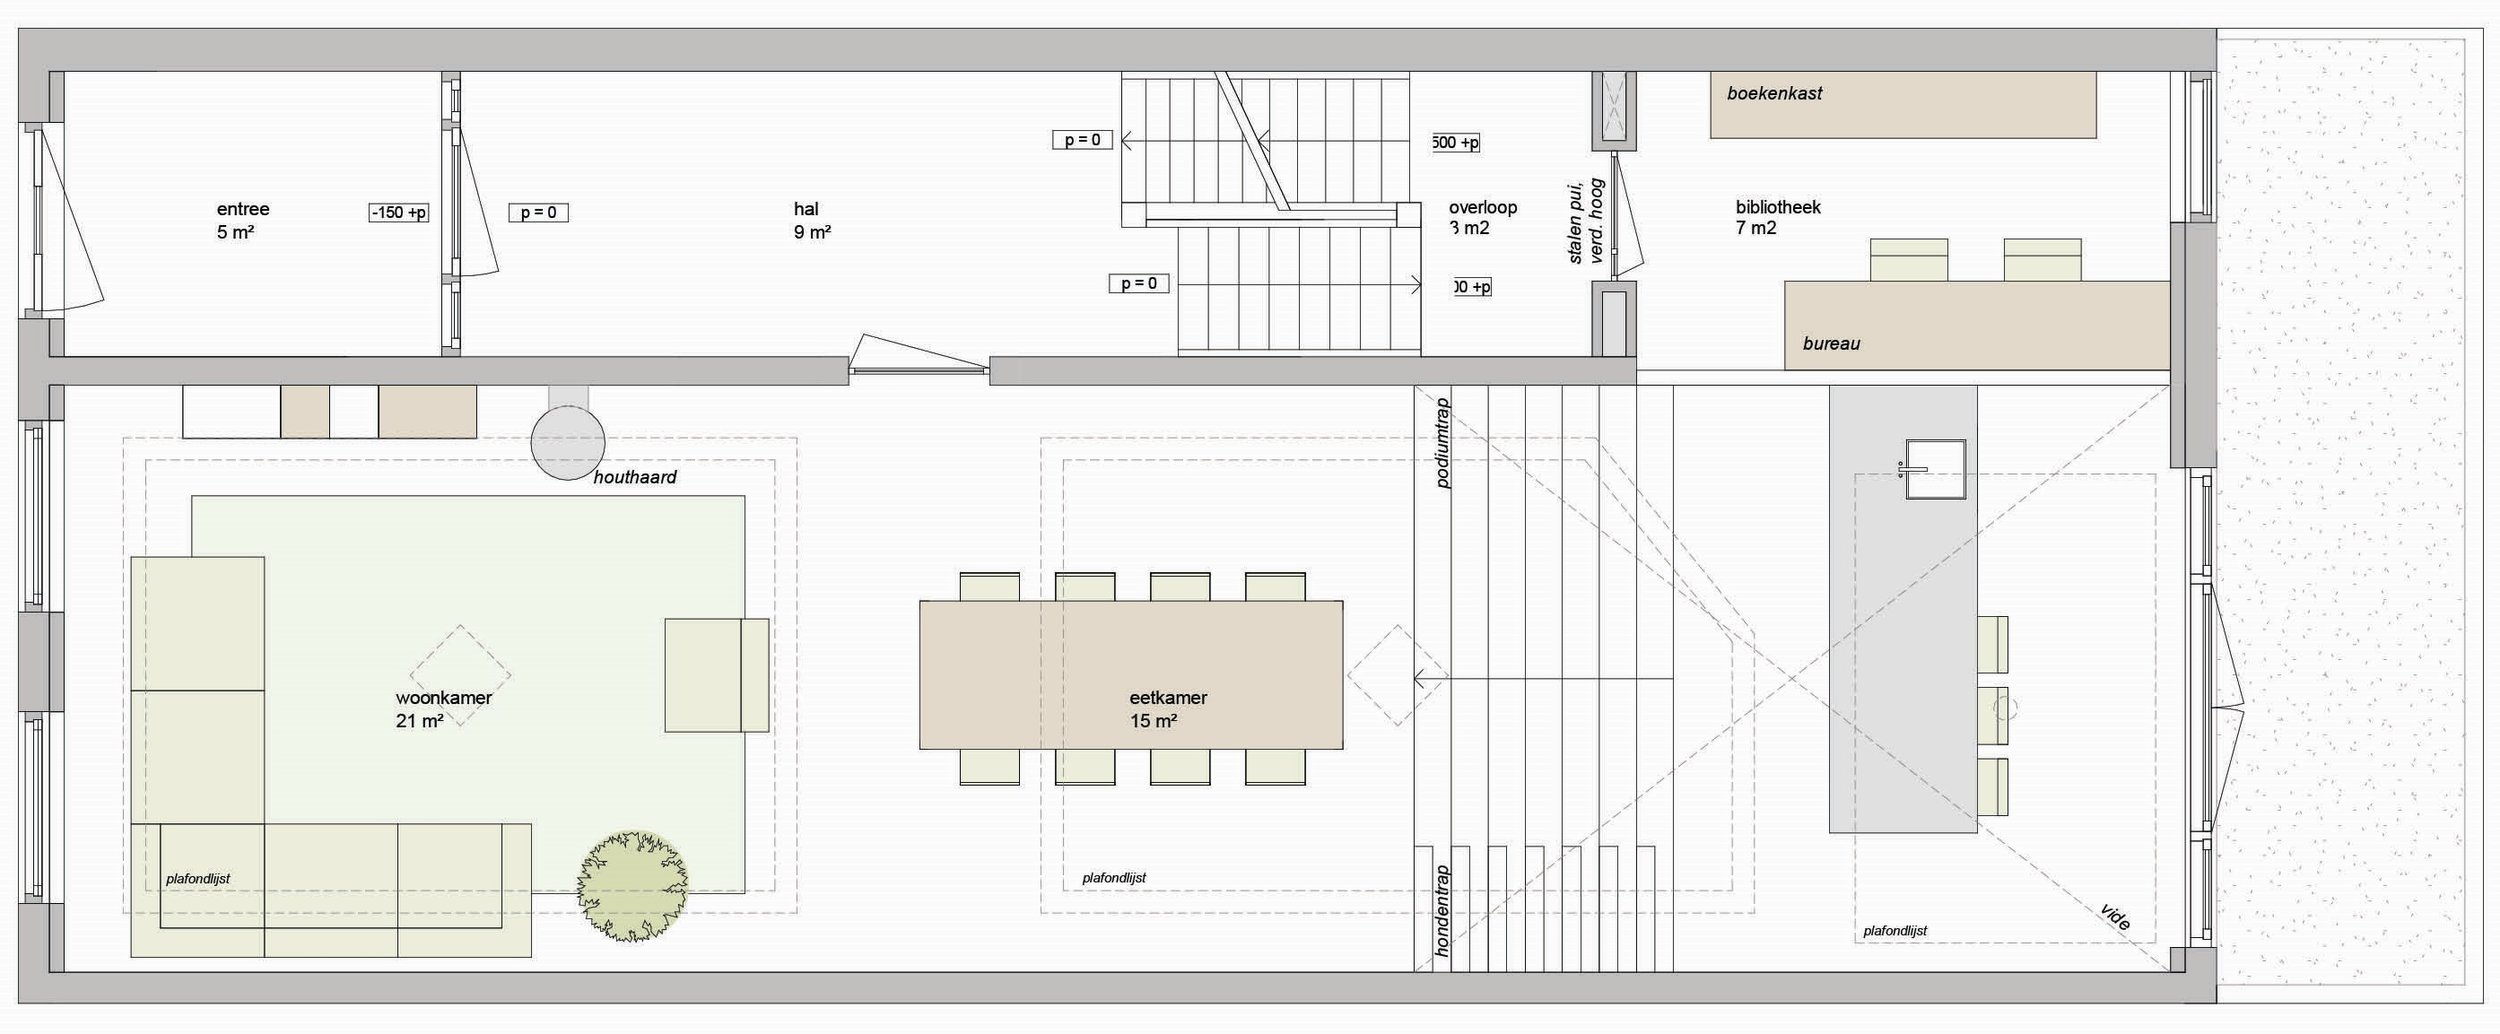 ground floor plan with mezzanine